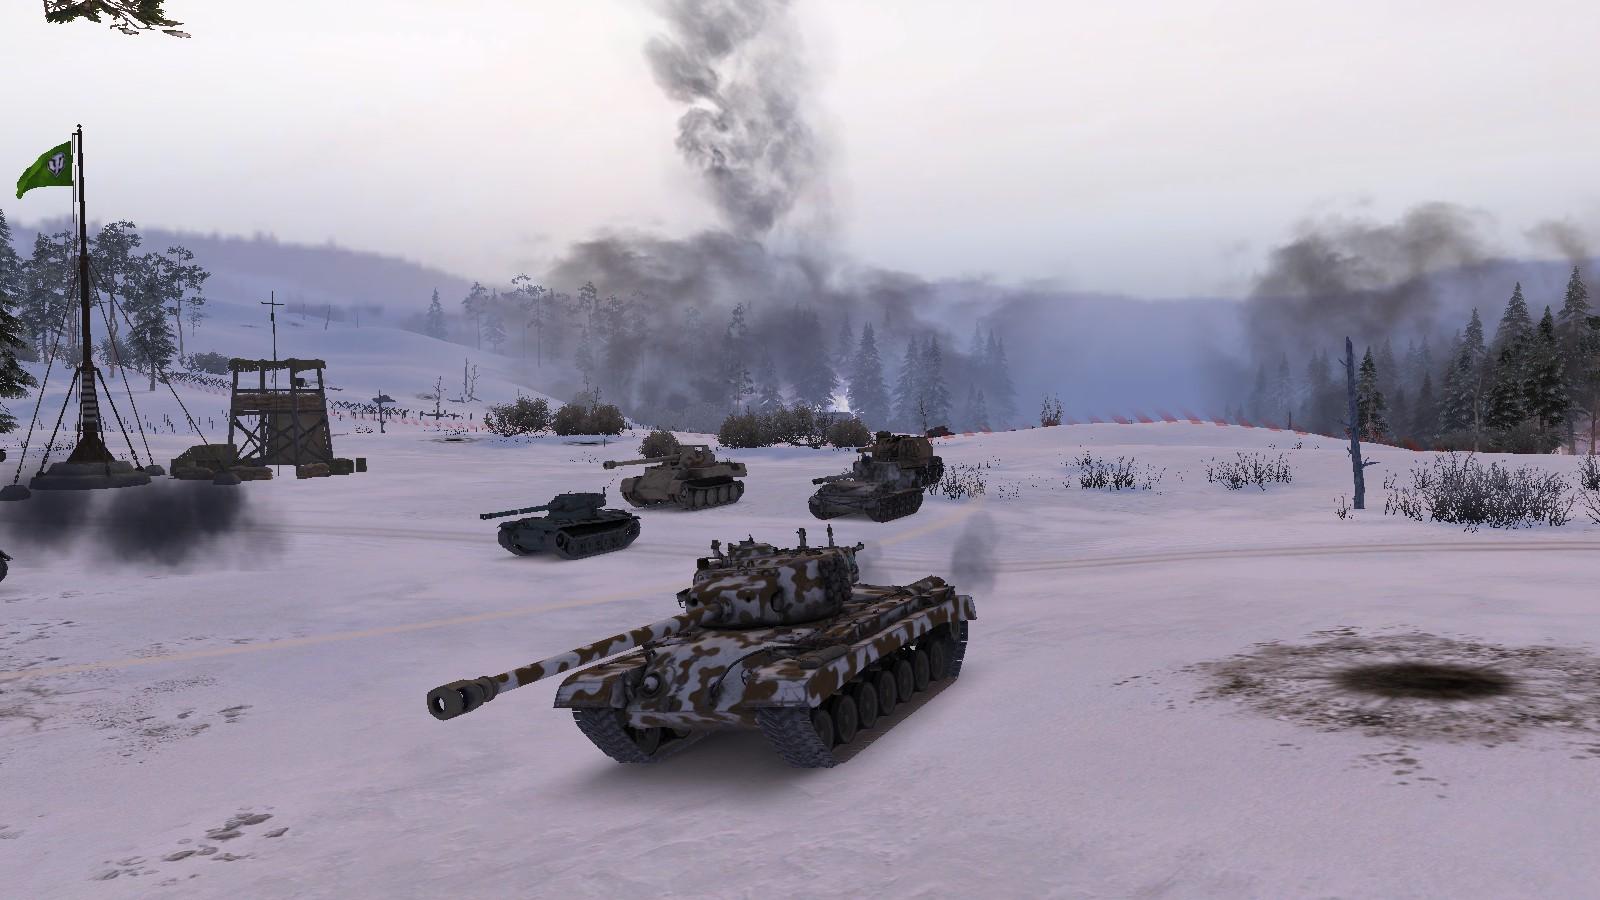 World of Tanks Screenshot 2019.01.12 - 19.10.15.30.jpg - World of Tanks